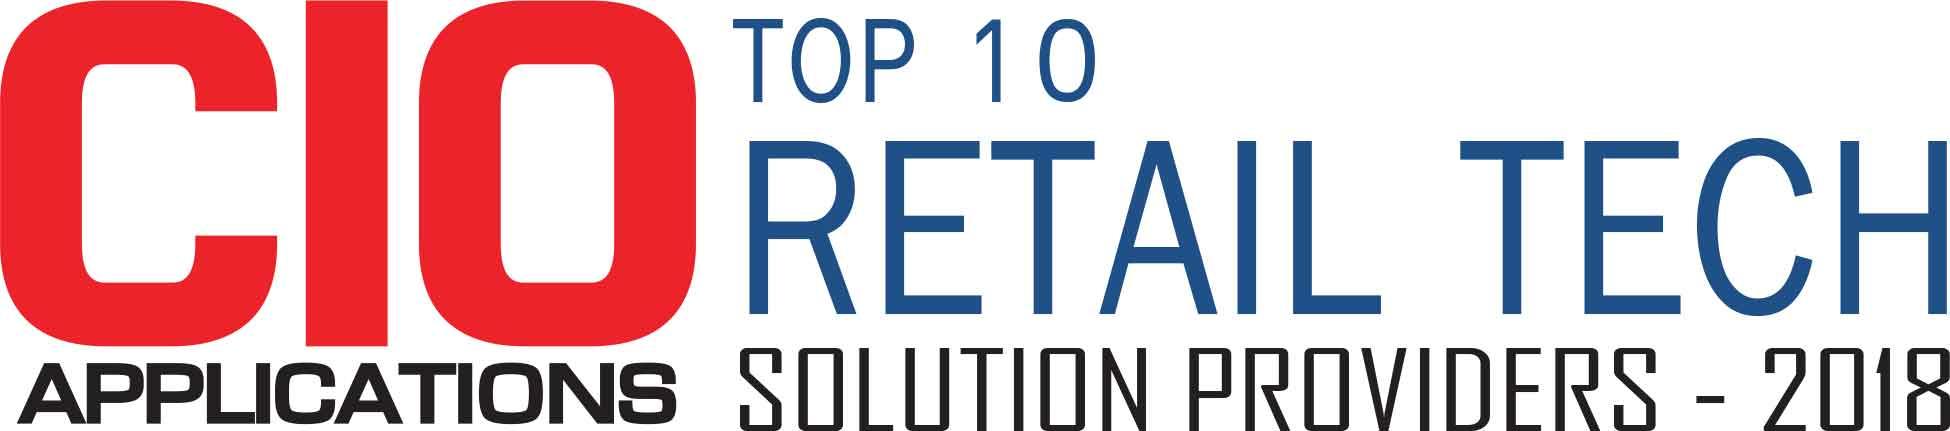 Top 10 Retail Tech Solution Companies - 2018